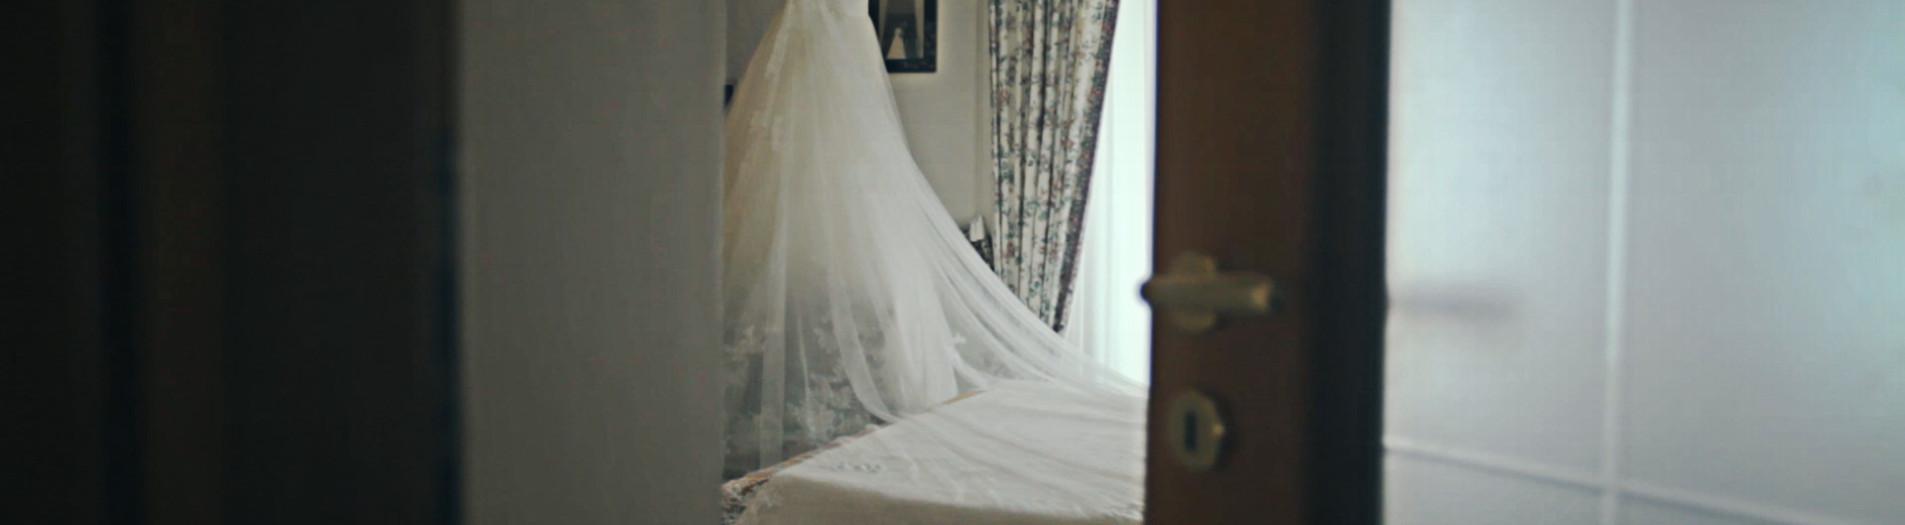 Trailer - Stefano e Roberta